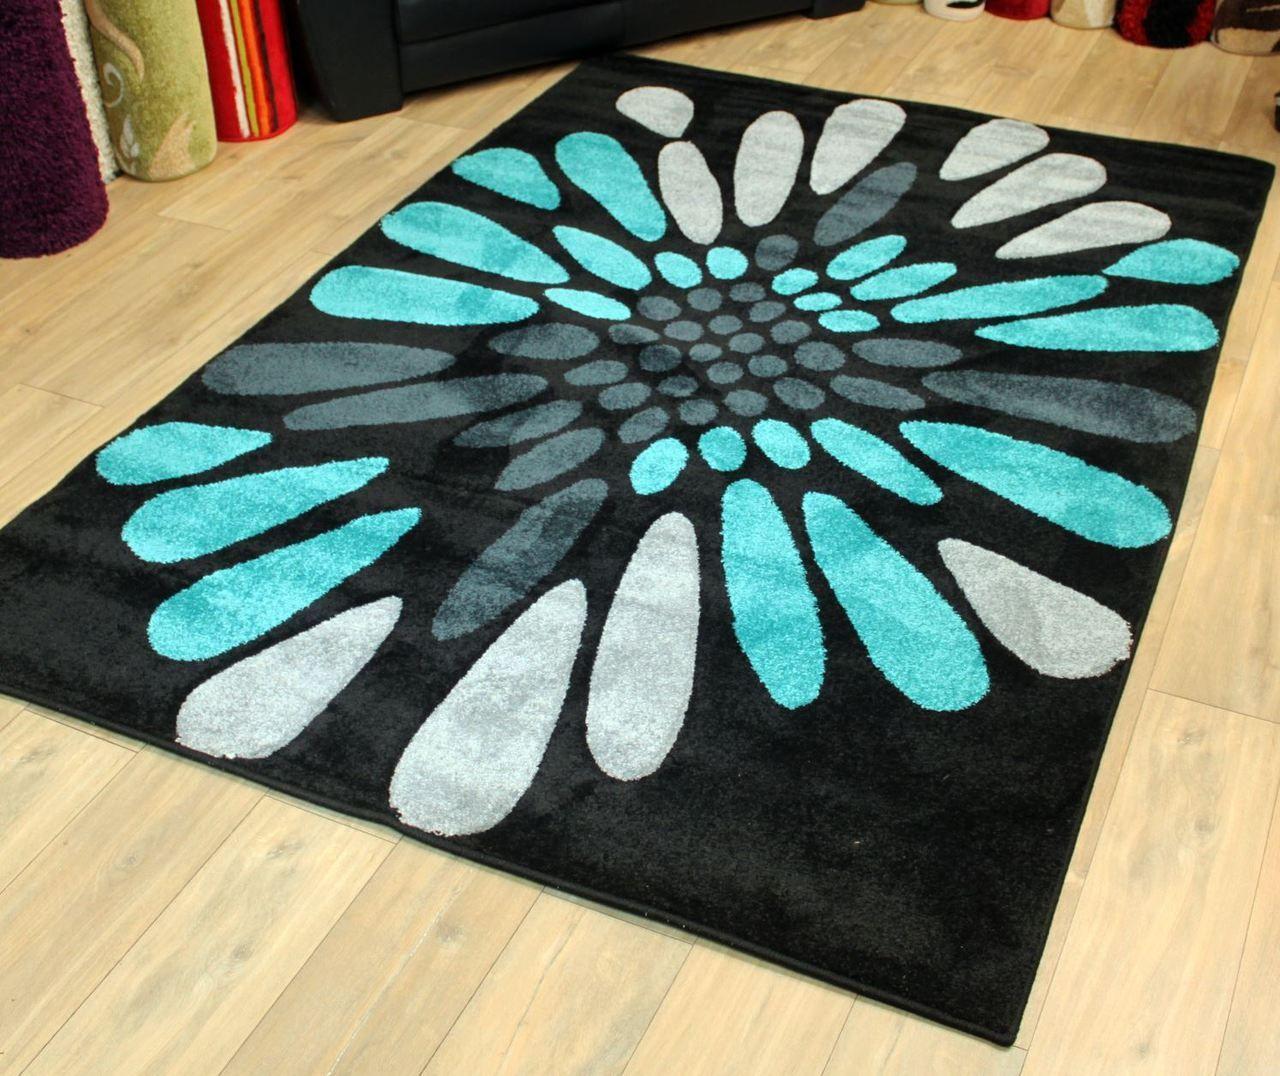 modern style rugs  viola k black teal blue cm x cm  - modern style rugs  viola k black teal blue cm x cm £ (